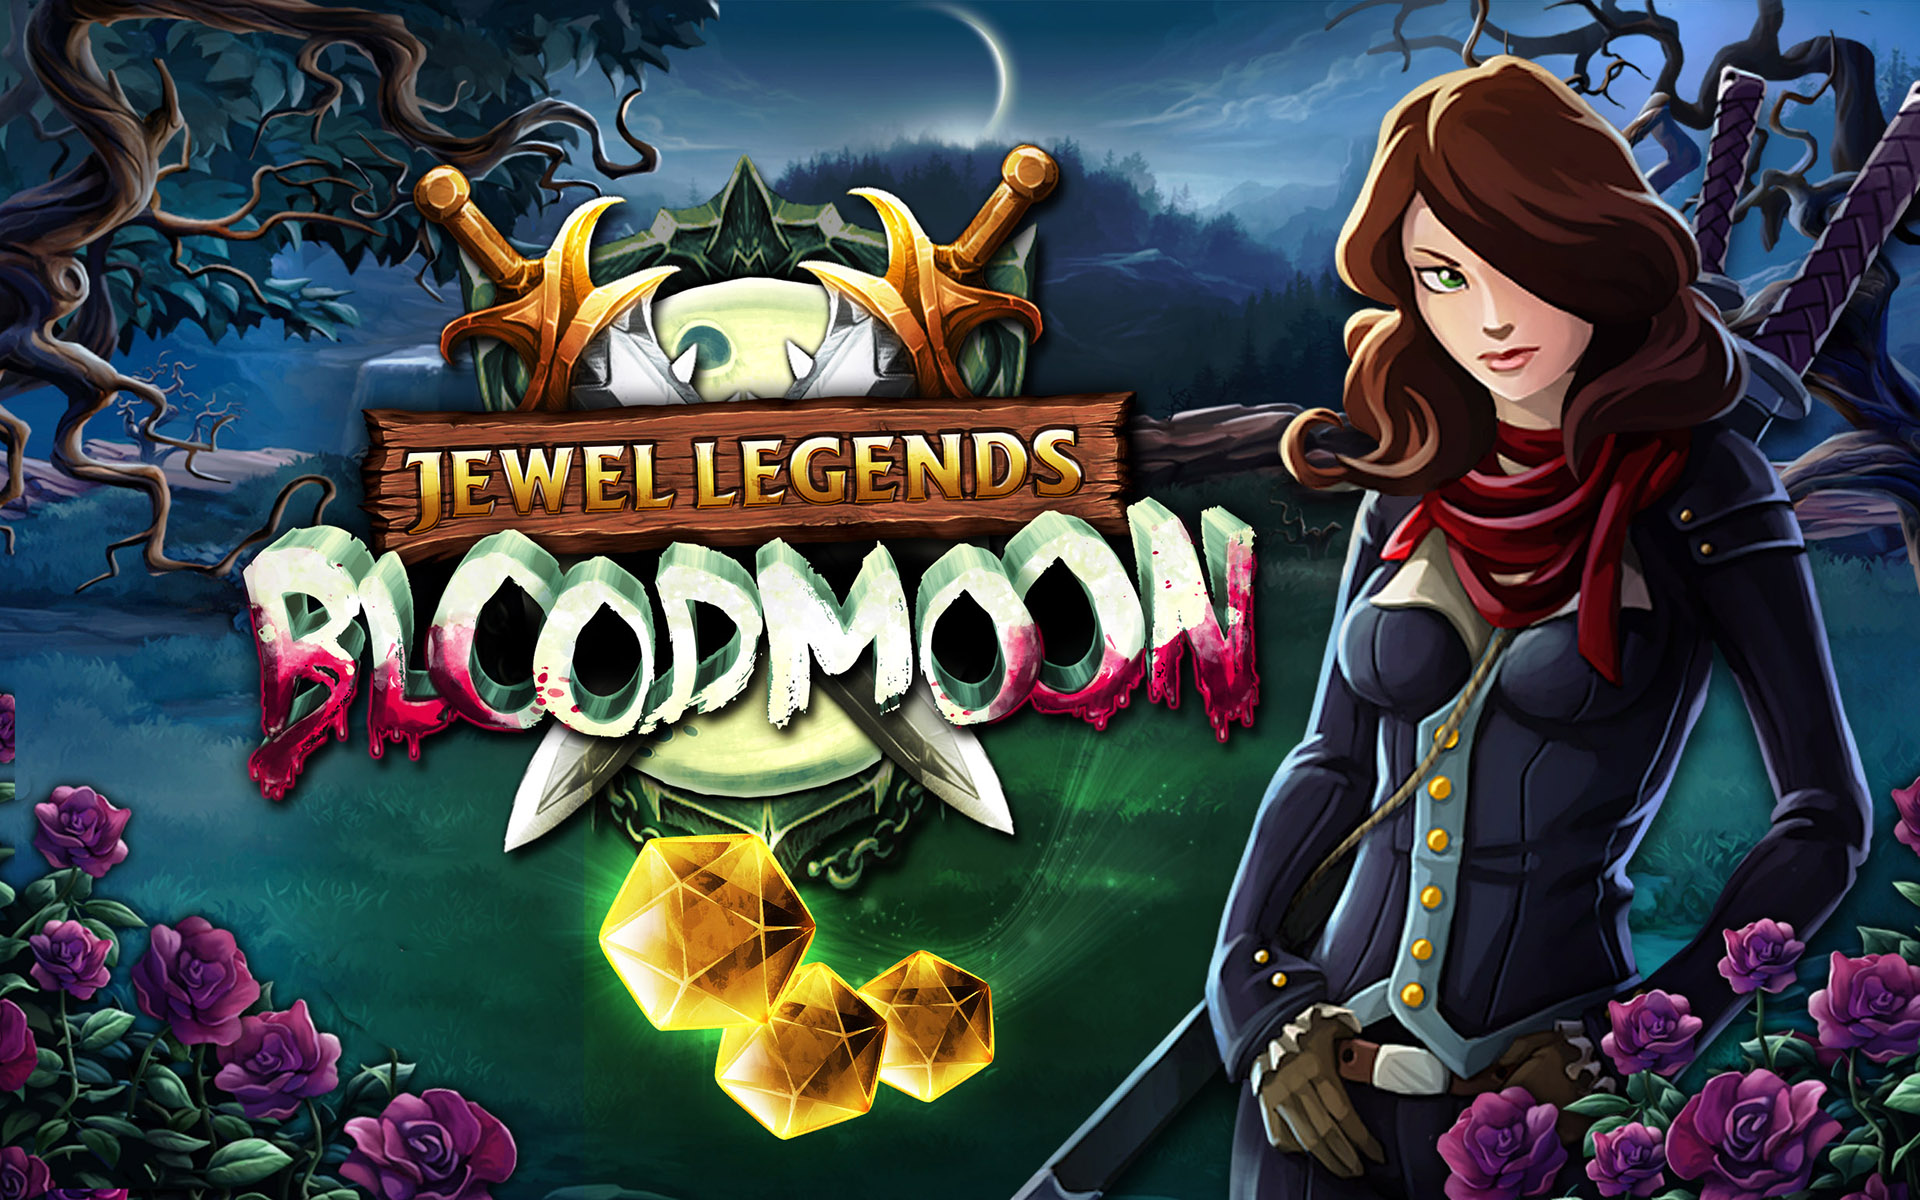 Jewel Legends - Bloodmoon: Amazon.es: Appstore para Android